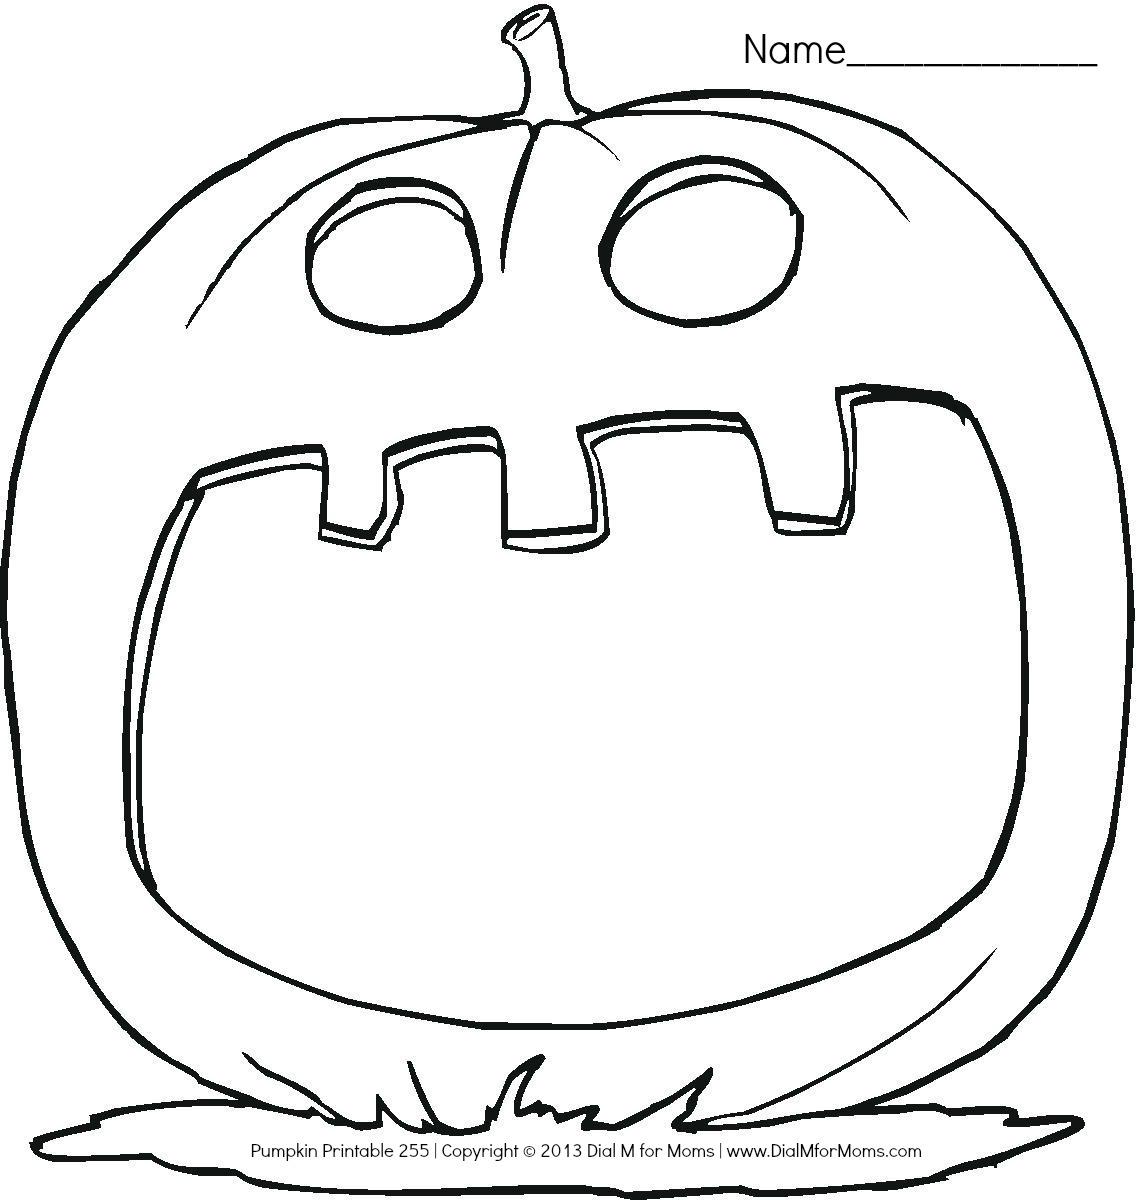 Free Pumpkin Line Drawing, Download Free Clip Art, Free Clip Art on ...